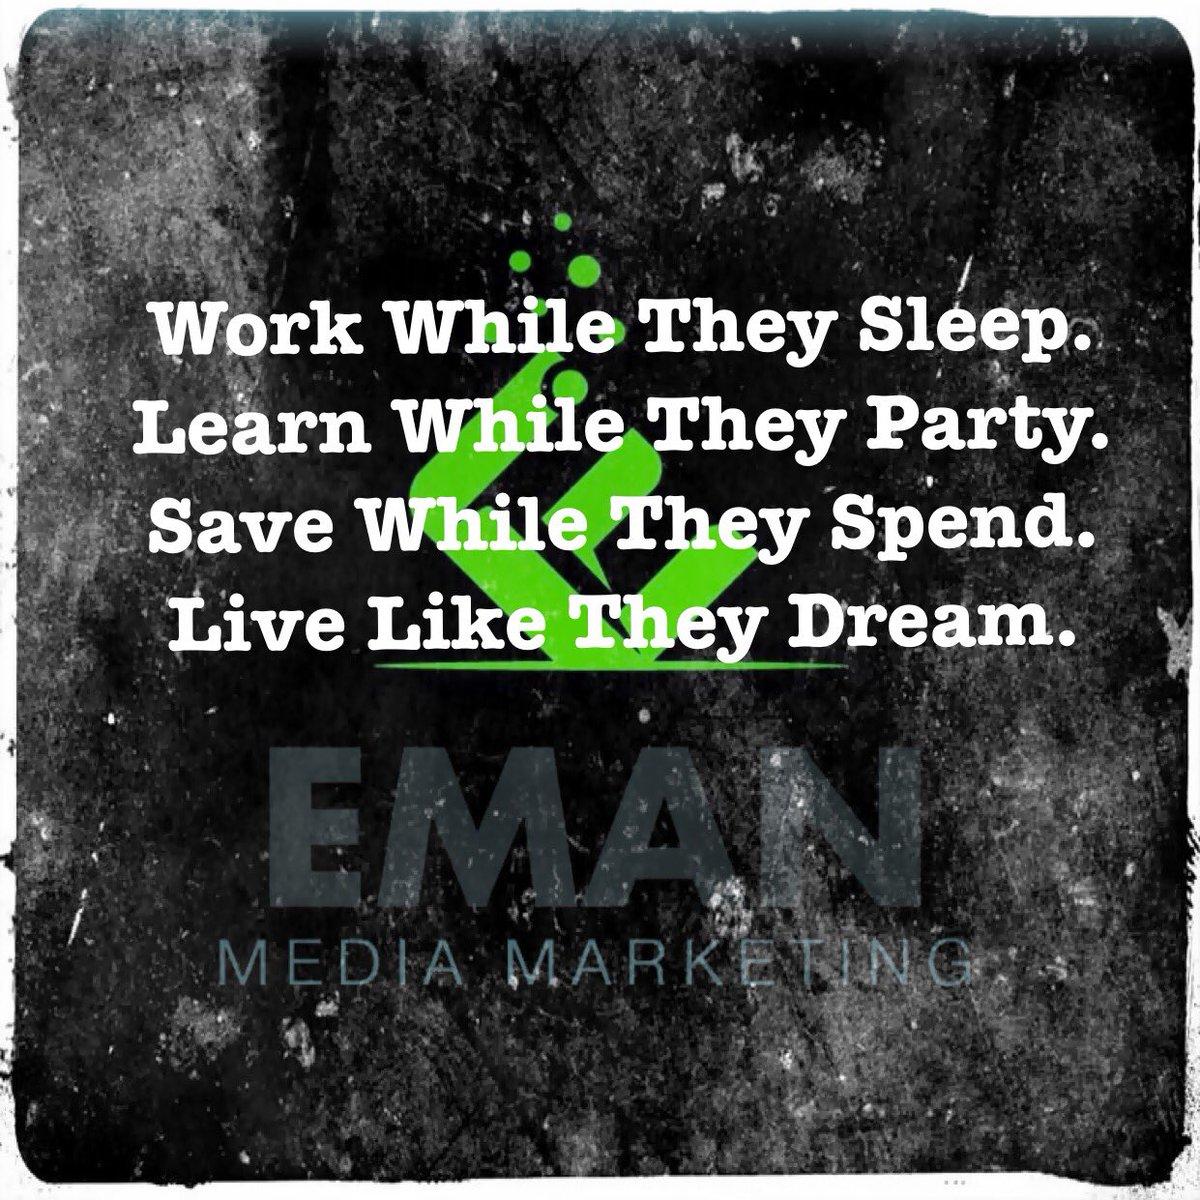 Work now party later #SEO #entrepreneurship #business #Marketing #SMMA #EmailMarketing #CEO #Hustle #Success #Businessman #Businesspassion #Grind #Socialmedia #Dreambig #Socialmediamarketing #Advertising #Workfromhome #Thinkbig #contentmarketing<br>http://pic.twitter.com/0zZEaDvsj2